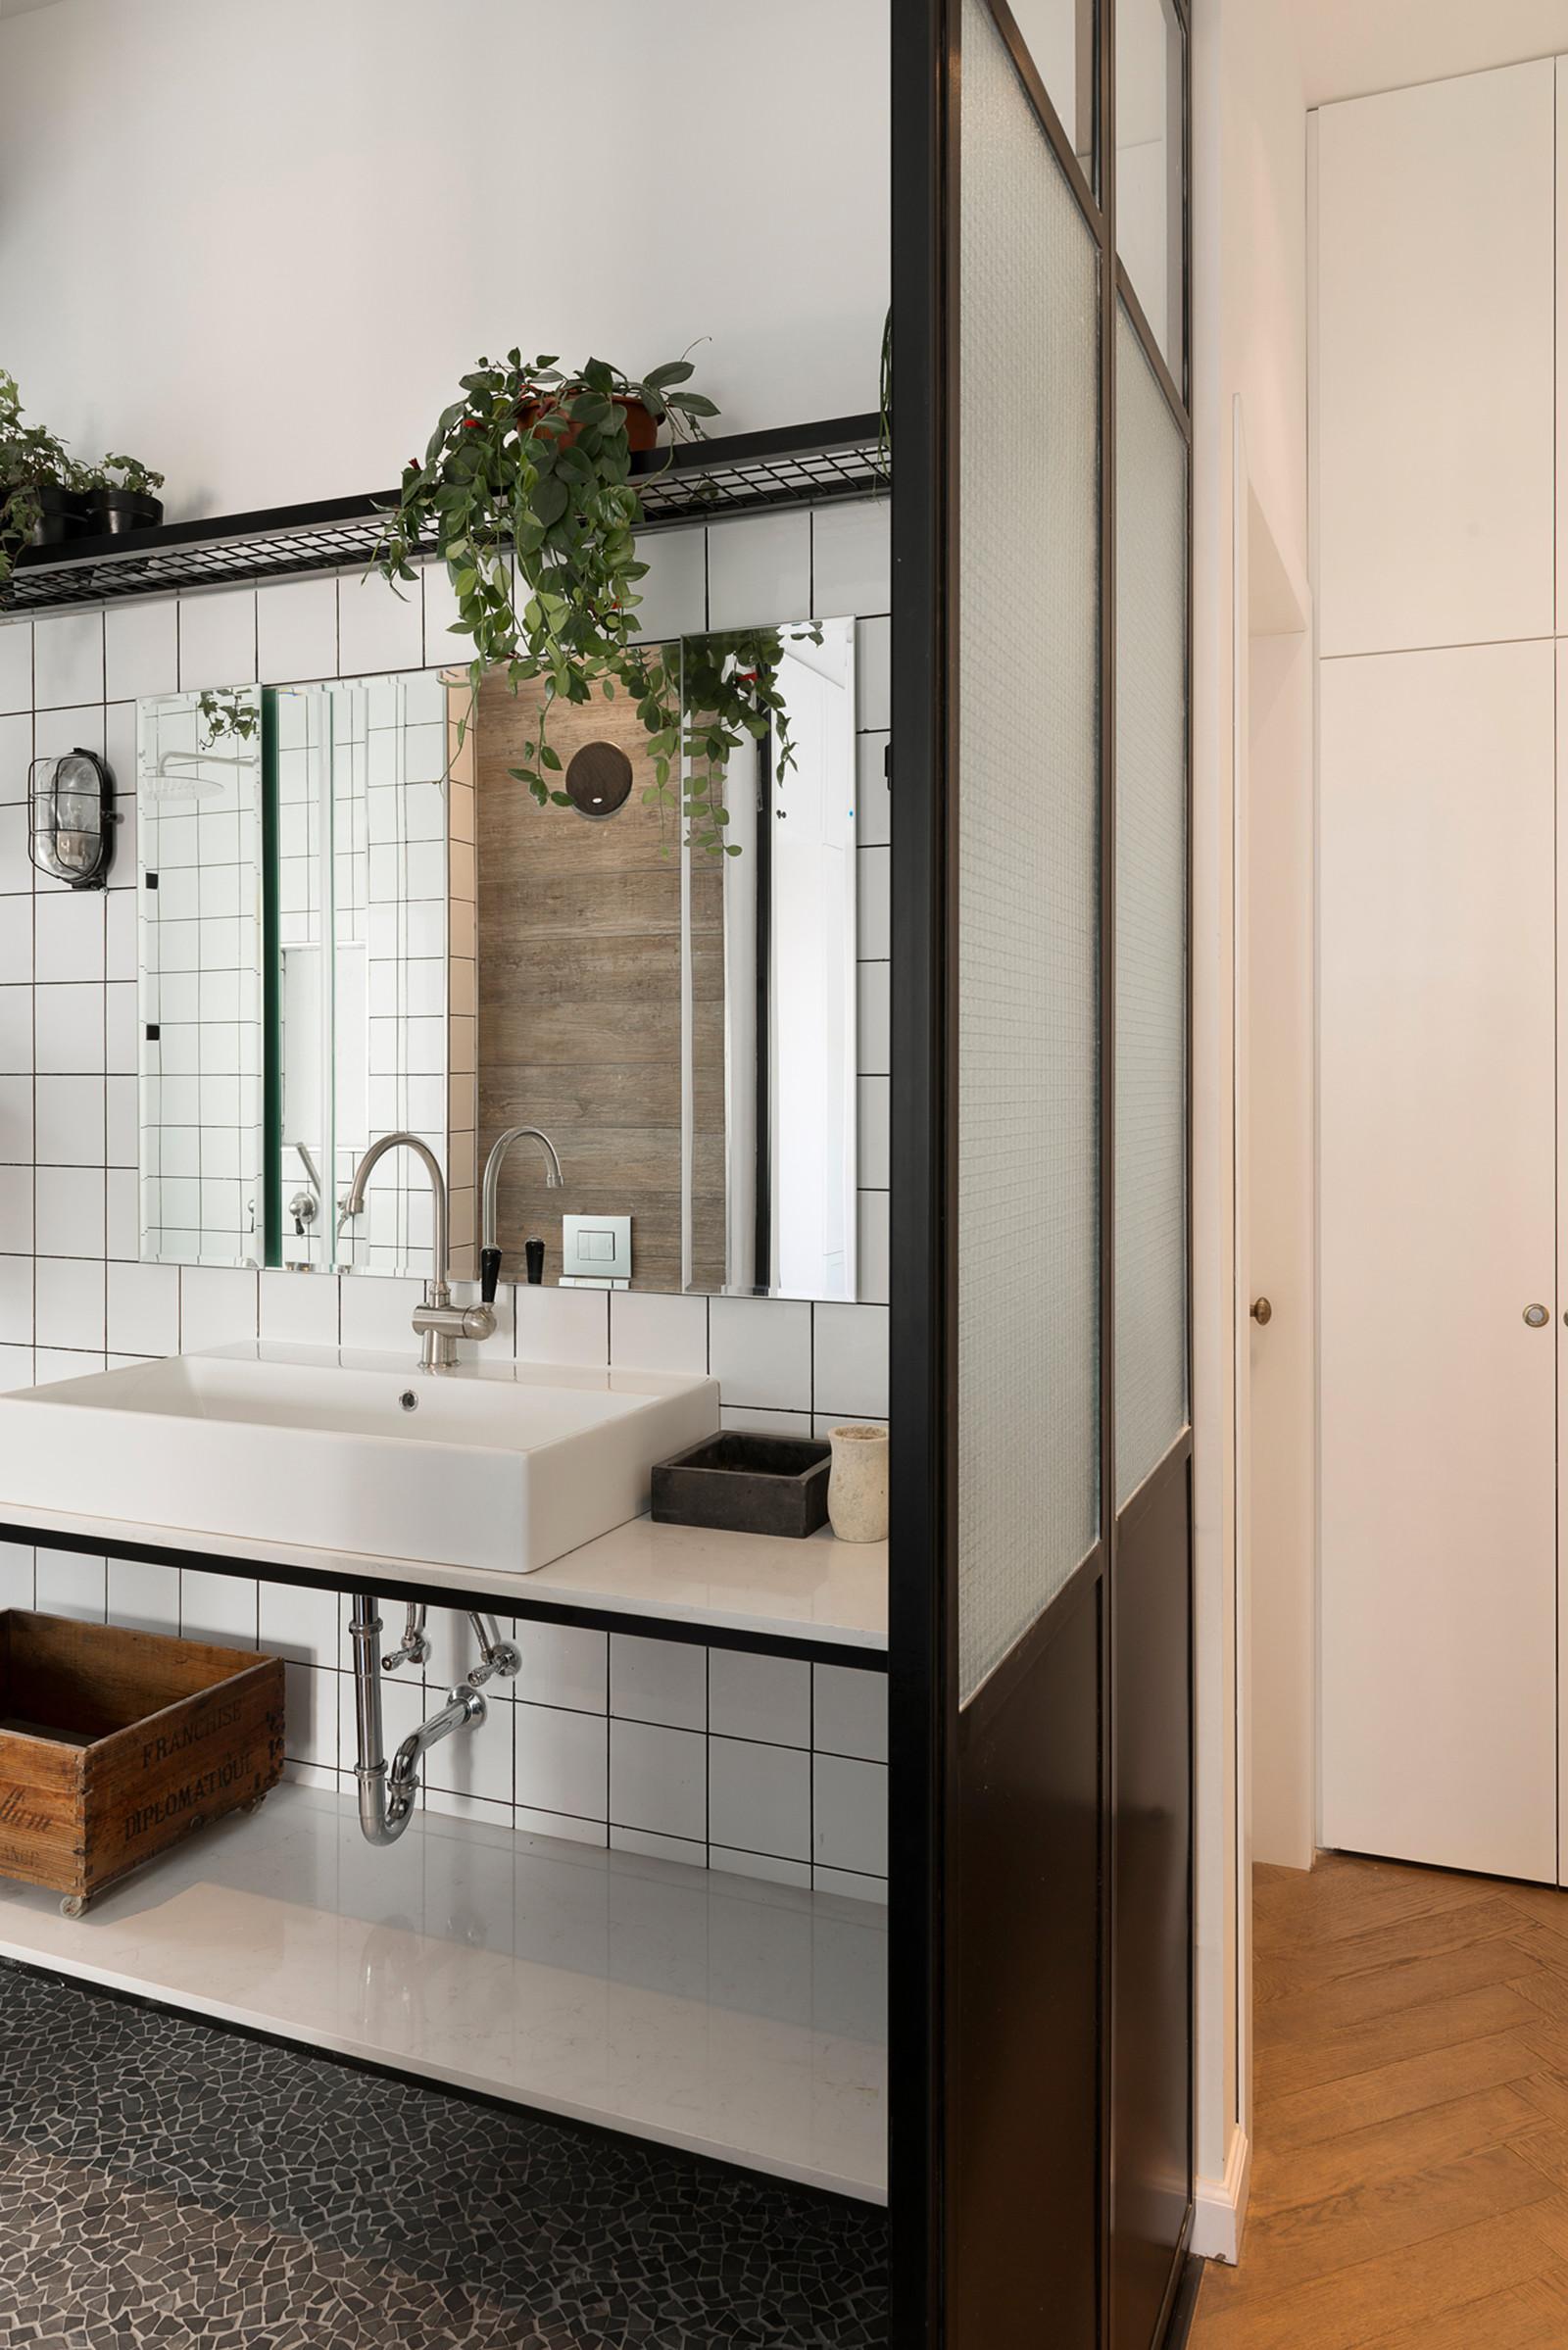 Apartment-renovation-just3ds.com-19